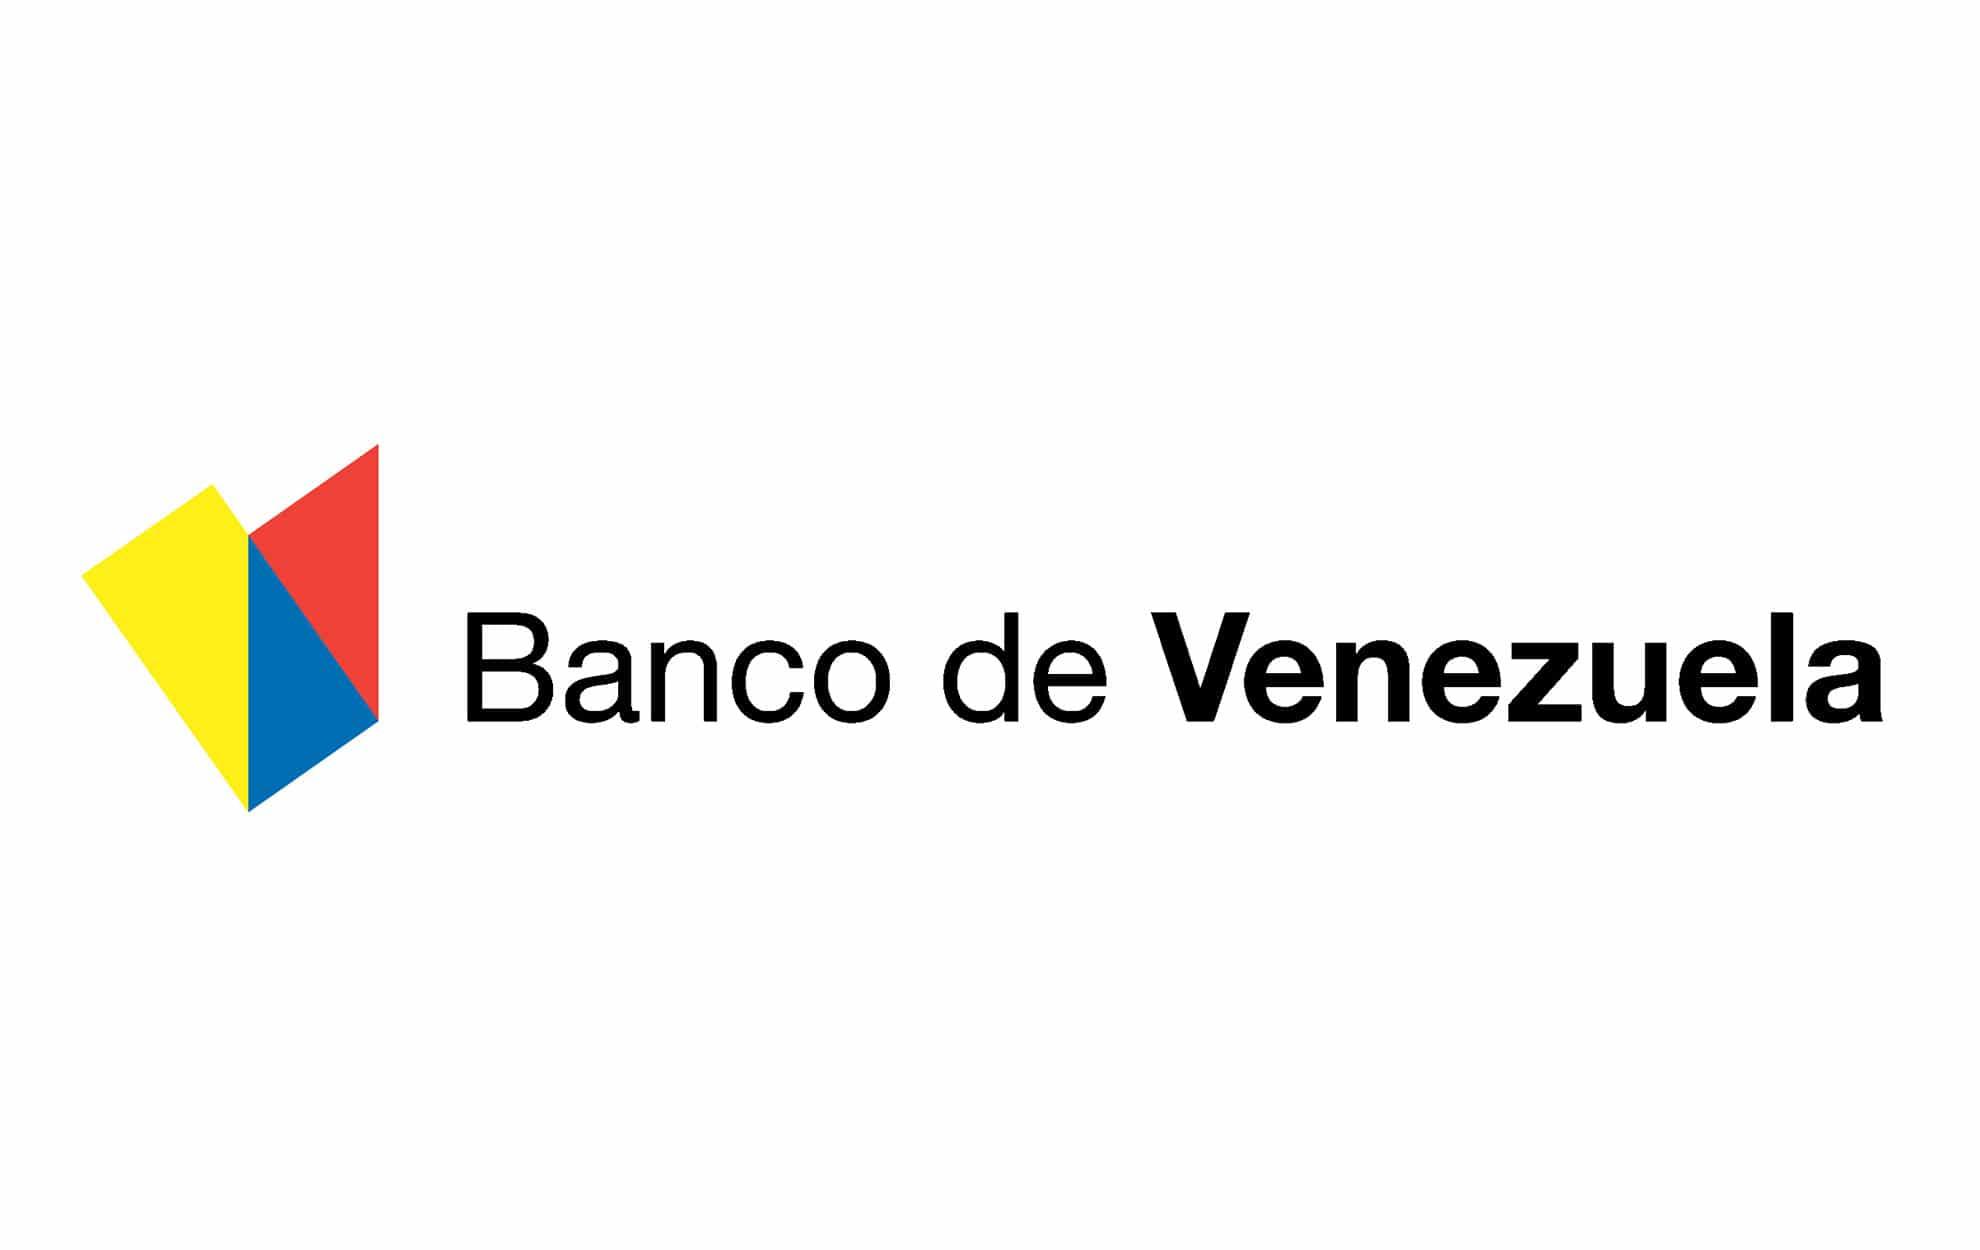 Banco de Venzuela Logo